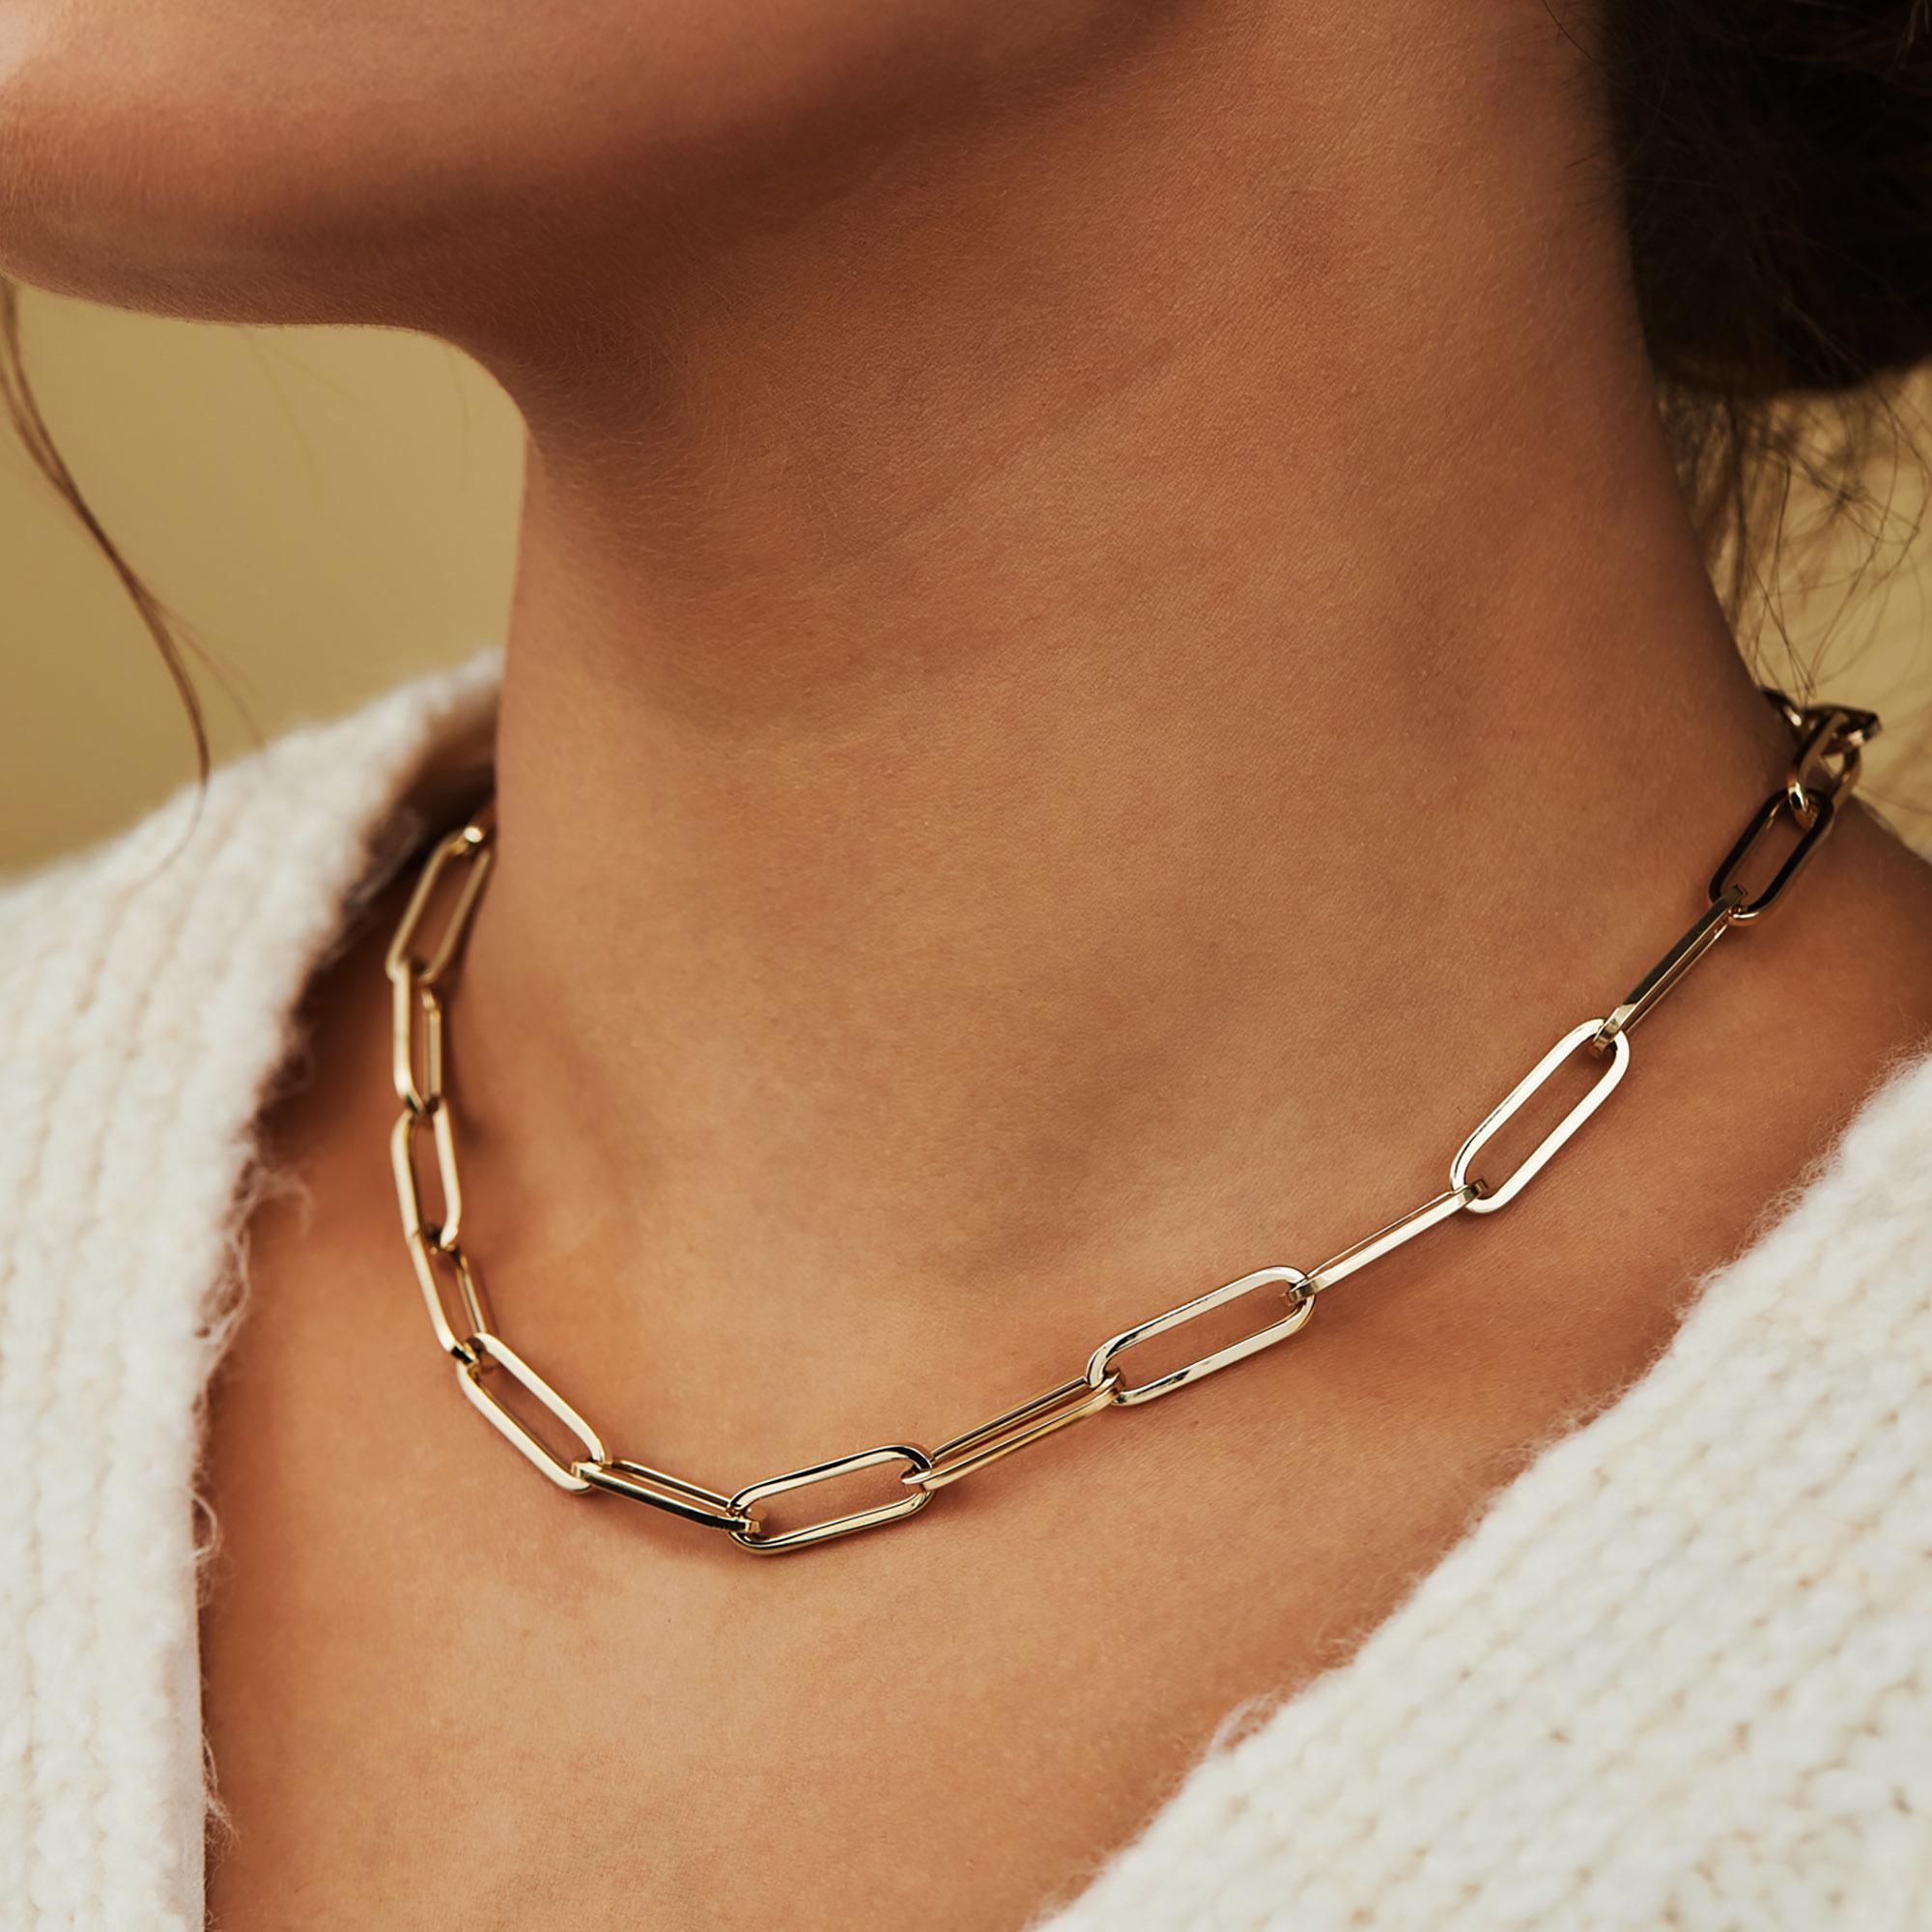 Isabel Bernard Aidee Idalie collana a maglie in oro 14 carati